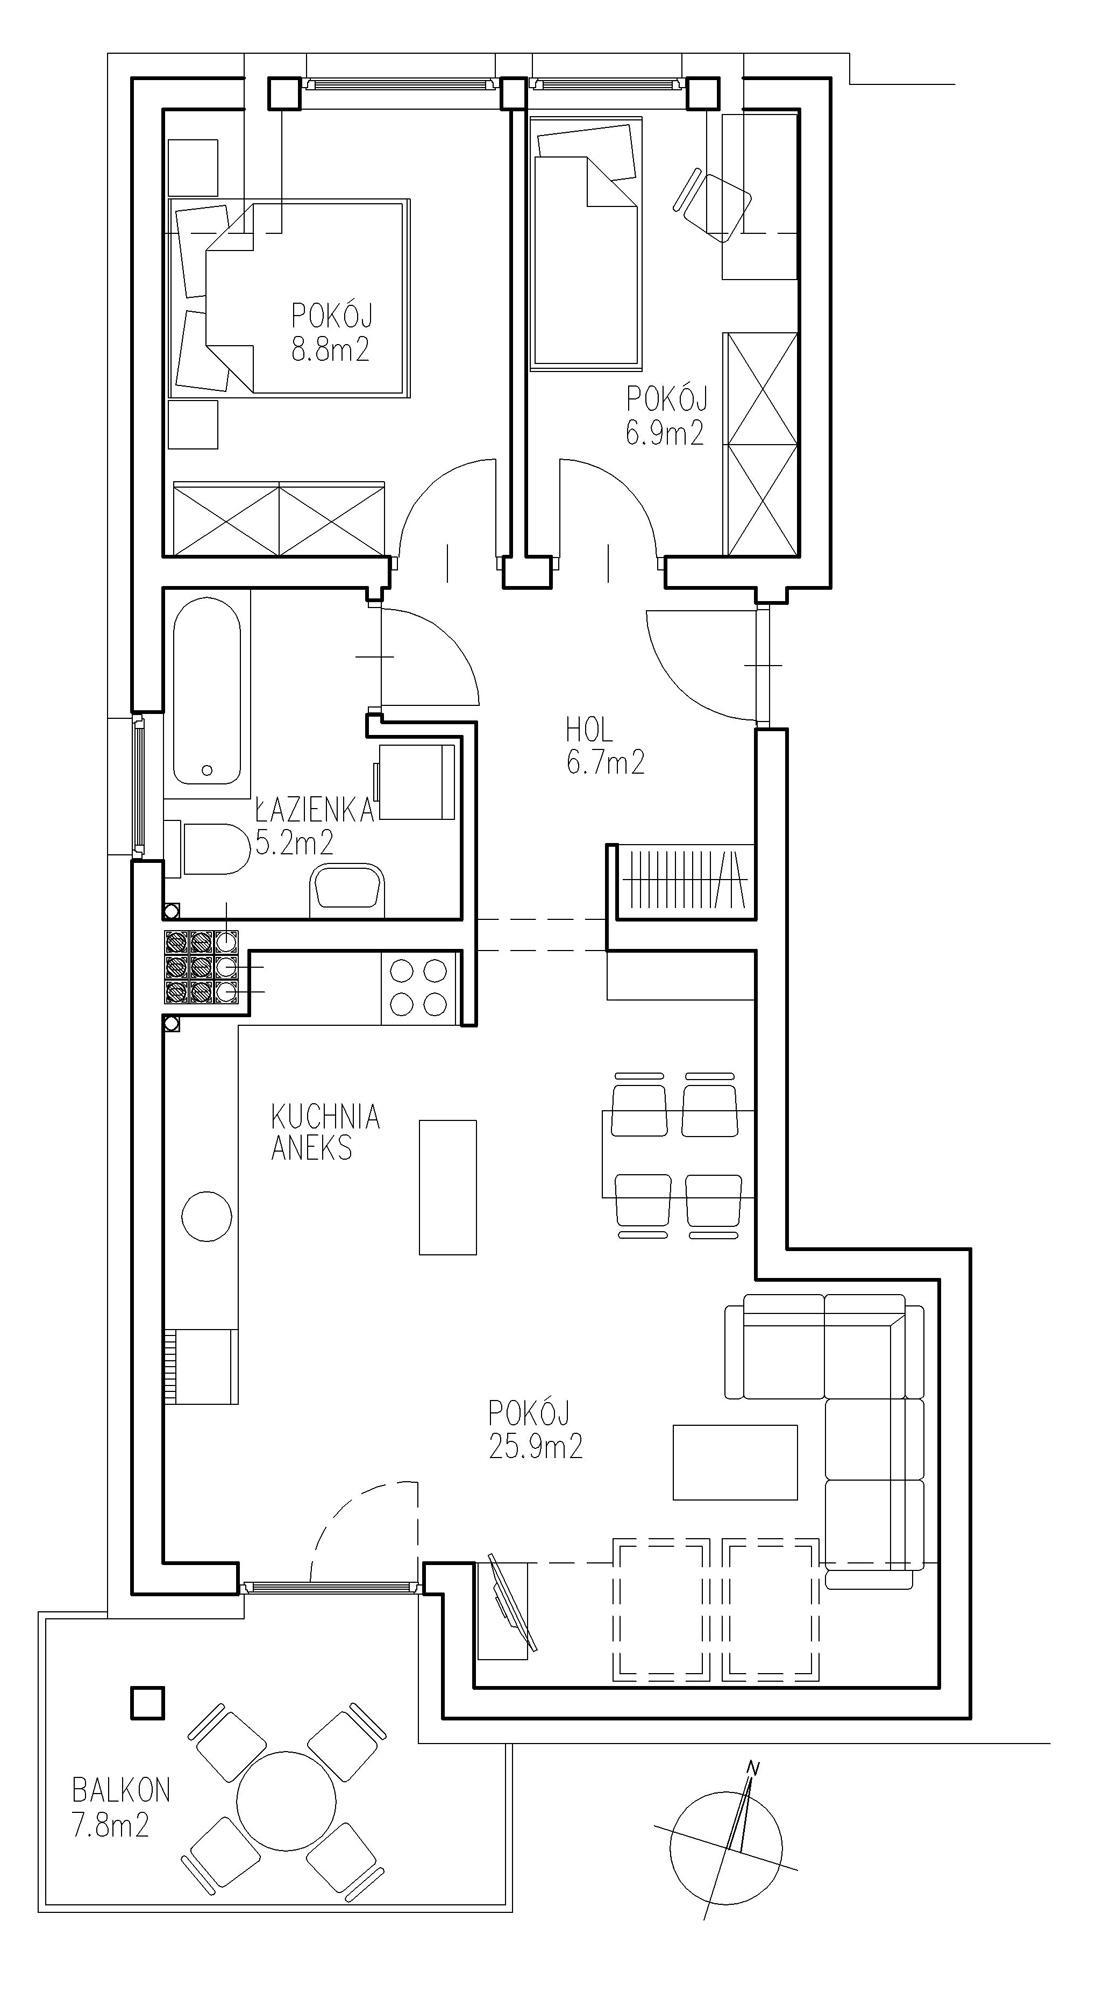 KTK Deweloper - Ełk - ul. Ogrodowa - Blok nr 2 - Mieszkanie nr 18